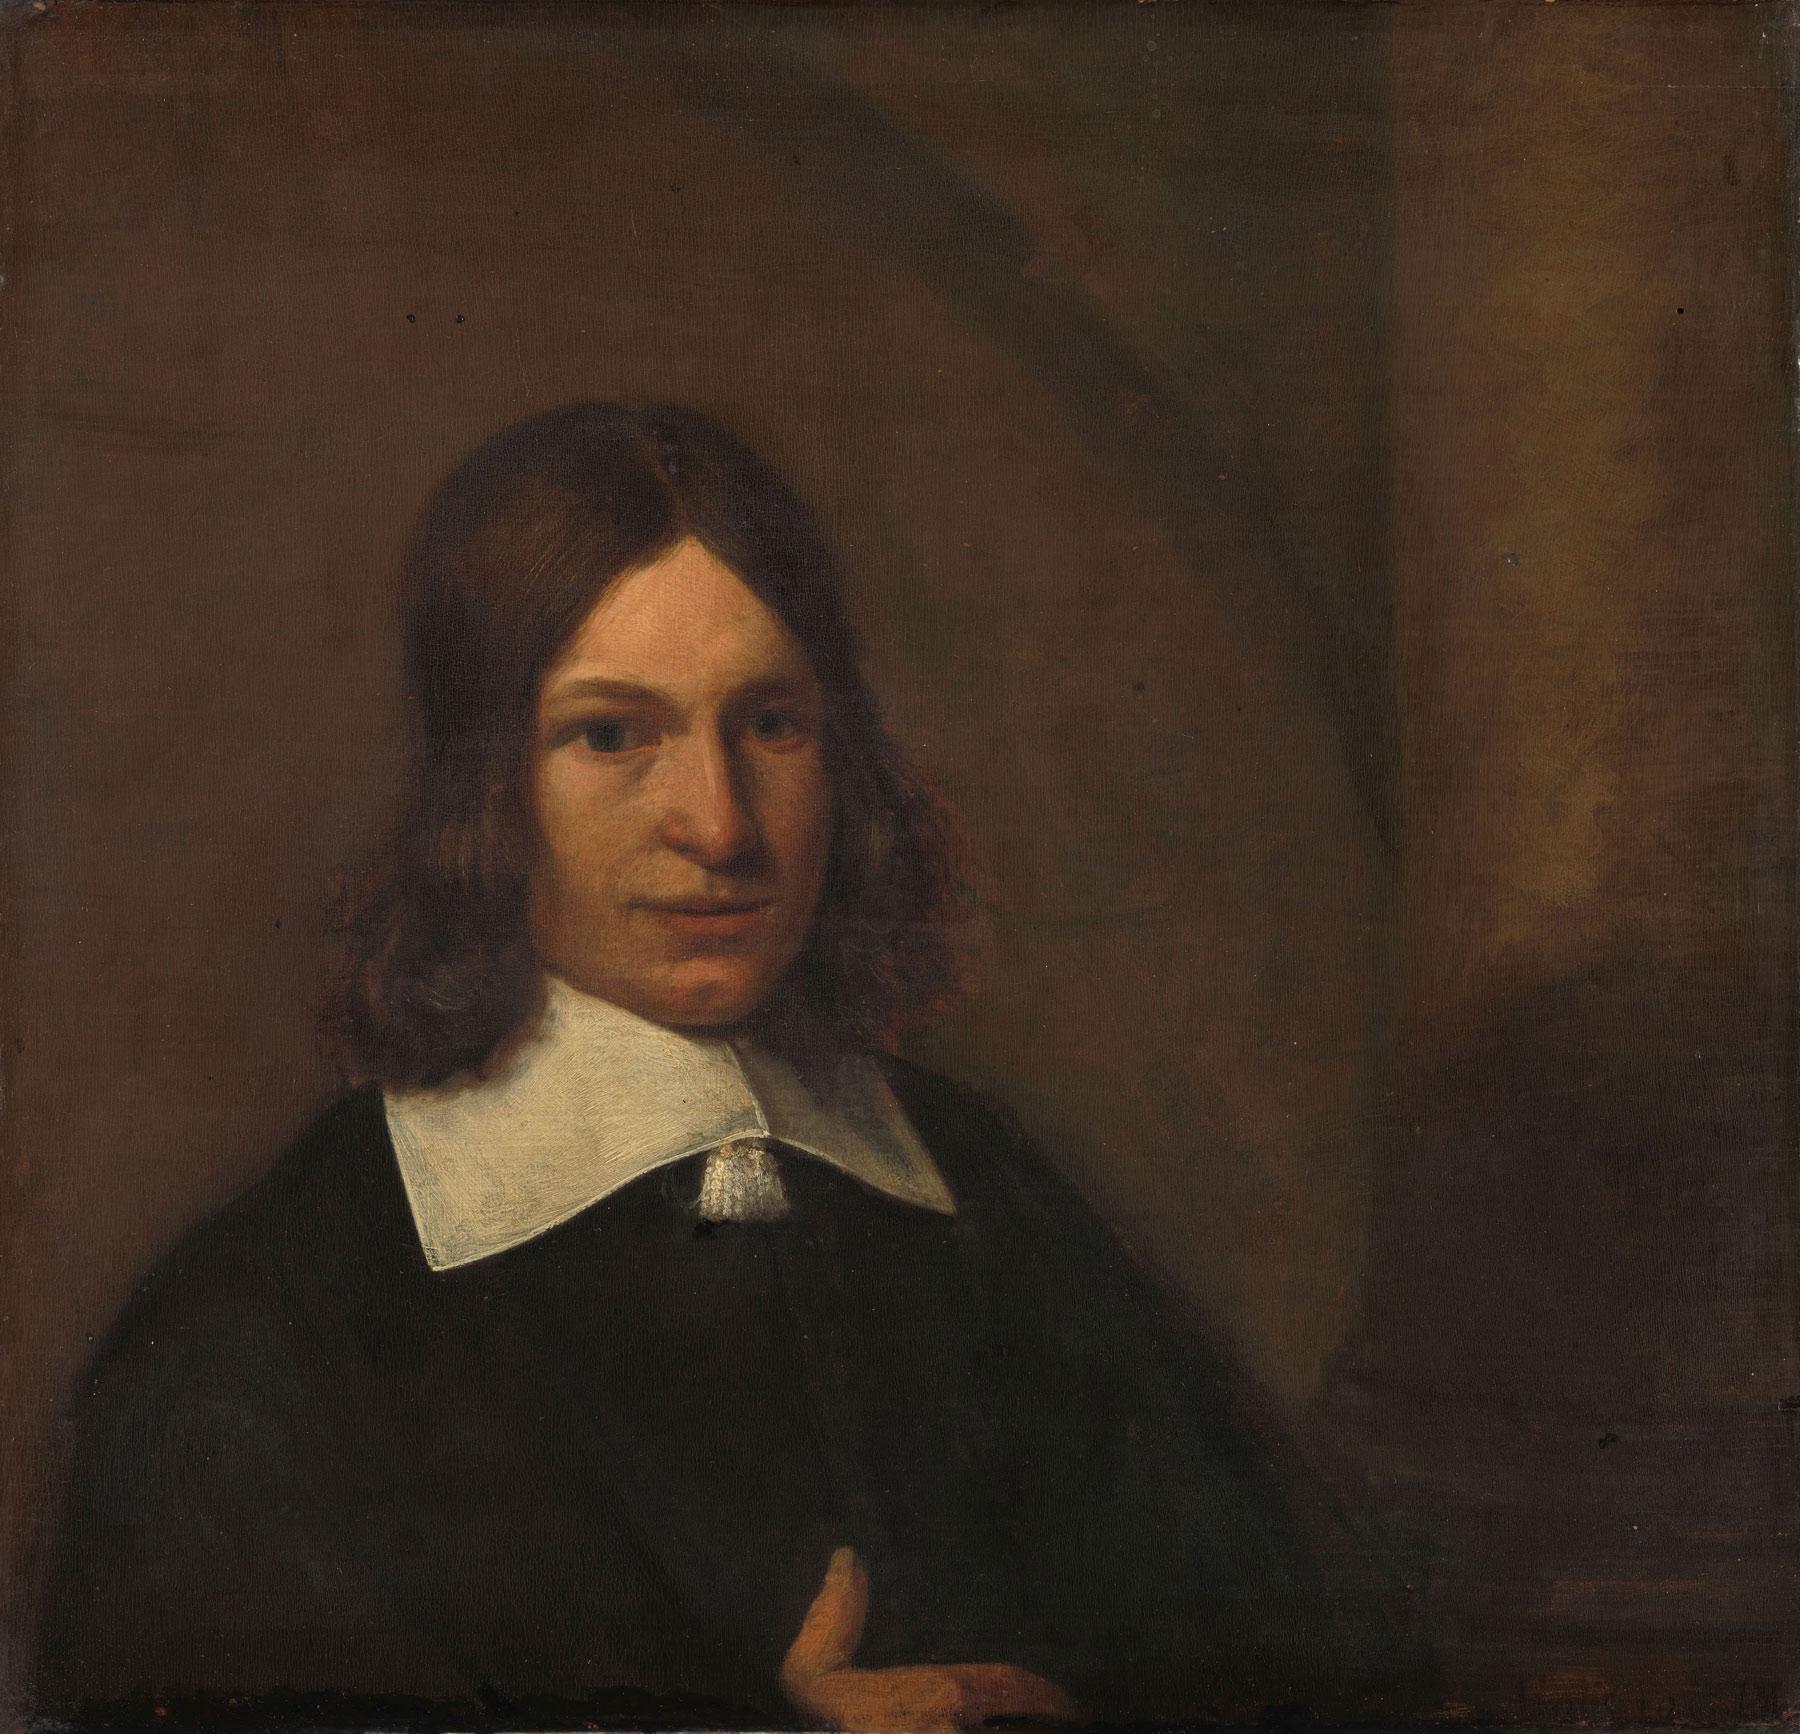 Pieter de Hooch (attribuito), Autoritratto? (1648-1649; olio su tavola, 32,5 x 34 cm; Amsterdam, Rijksmuseum)